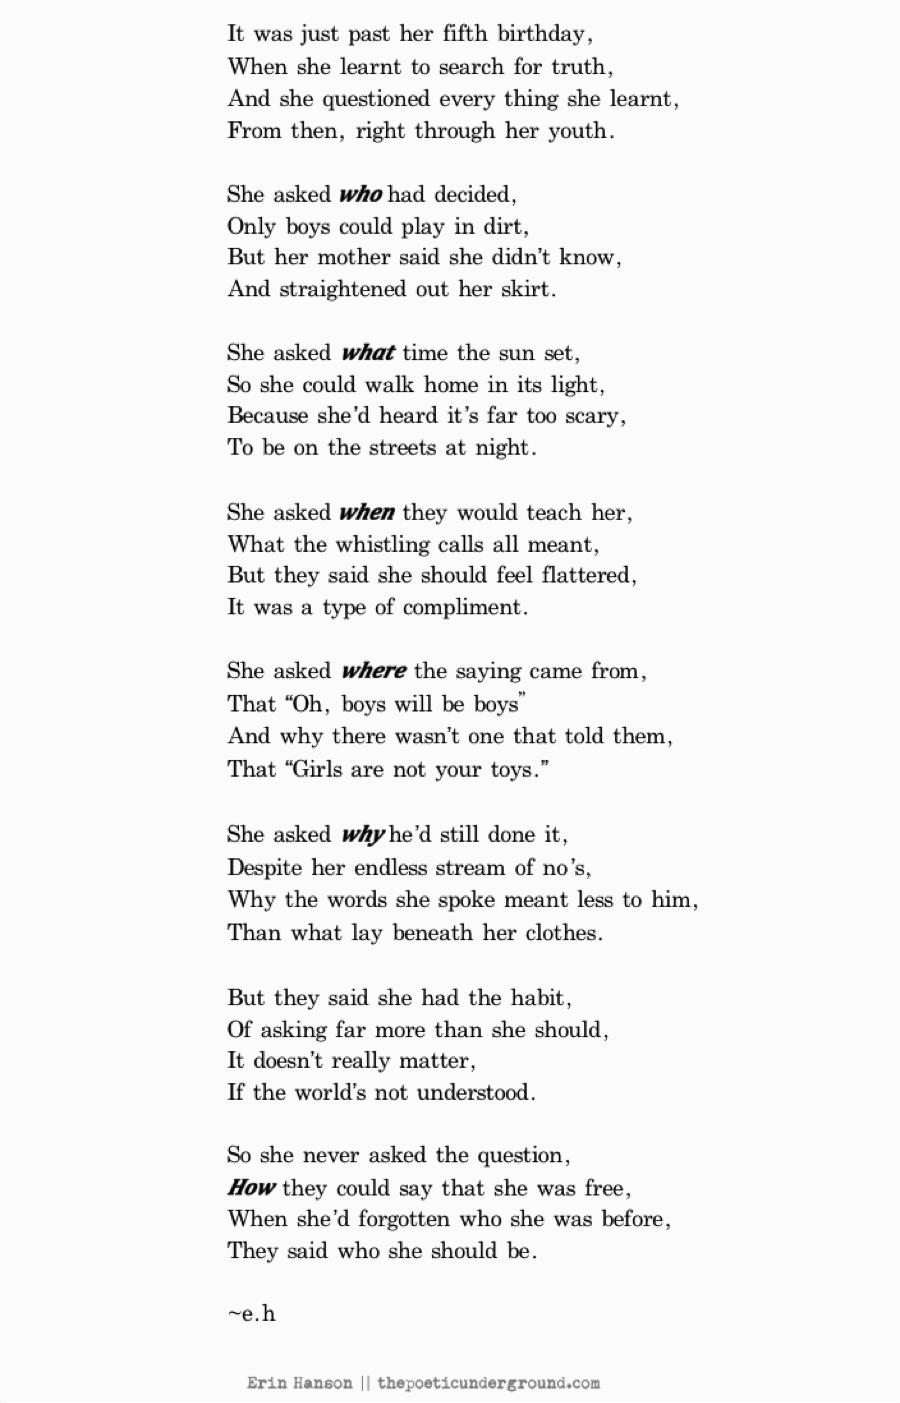 Motivational poems for her